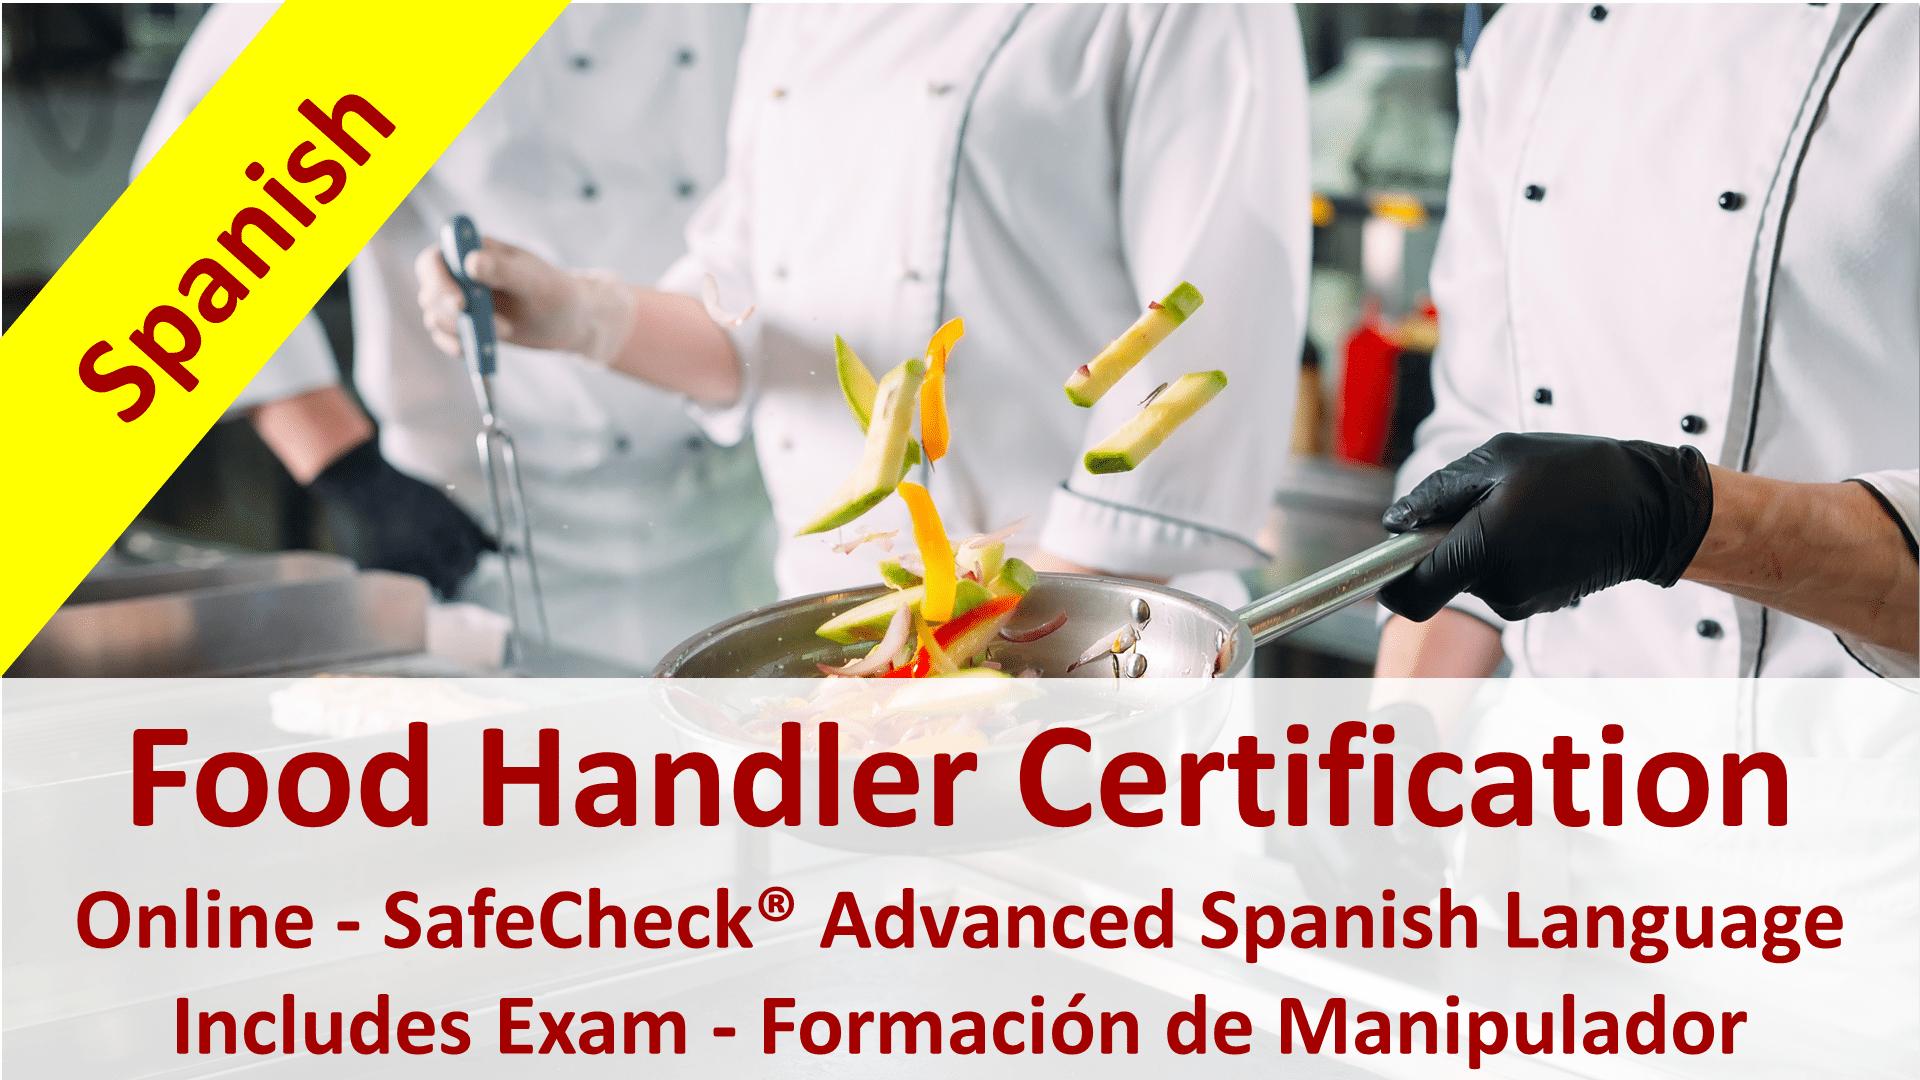 Image of the SafeCheck Spanish Language Food Handler Course